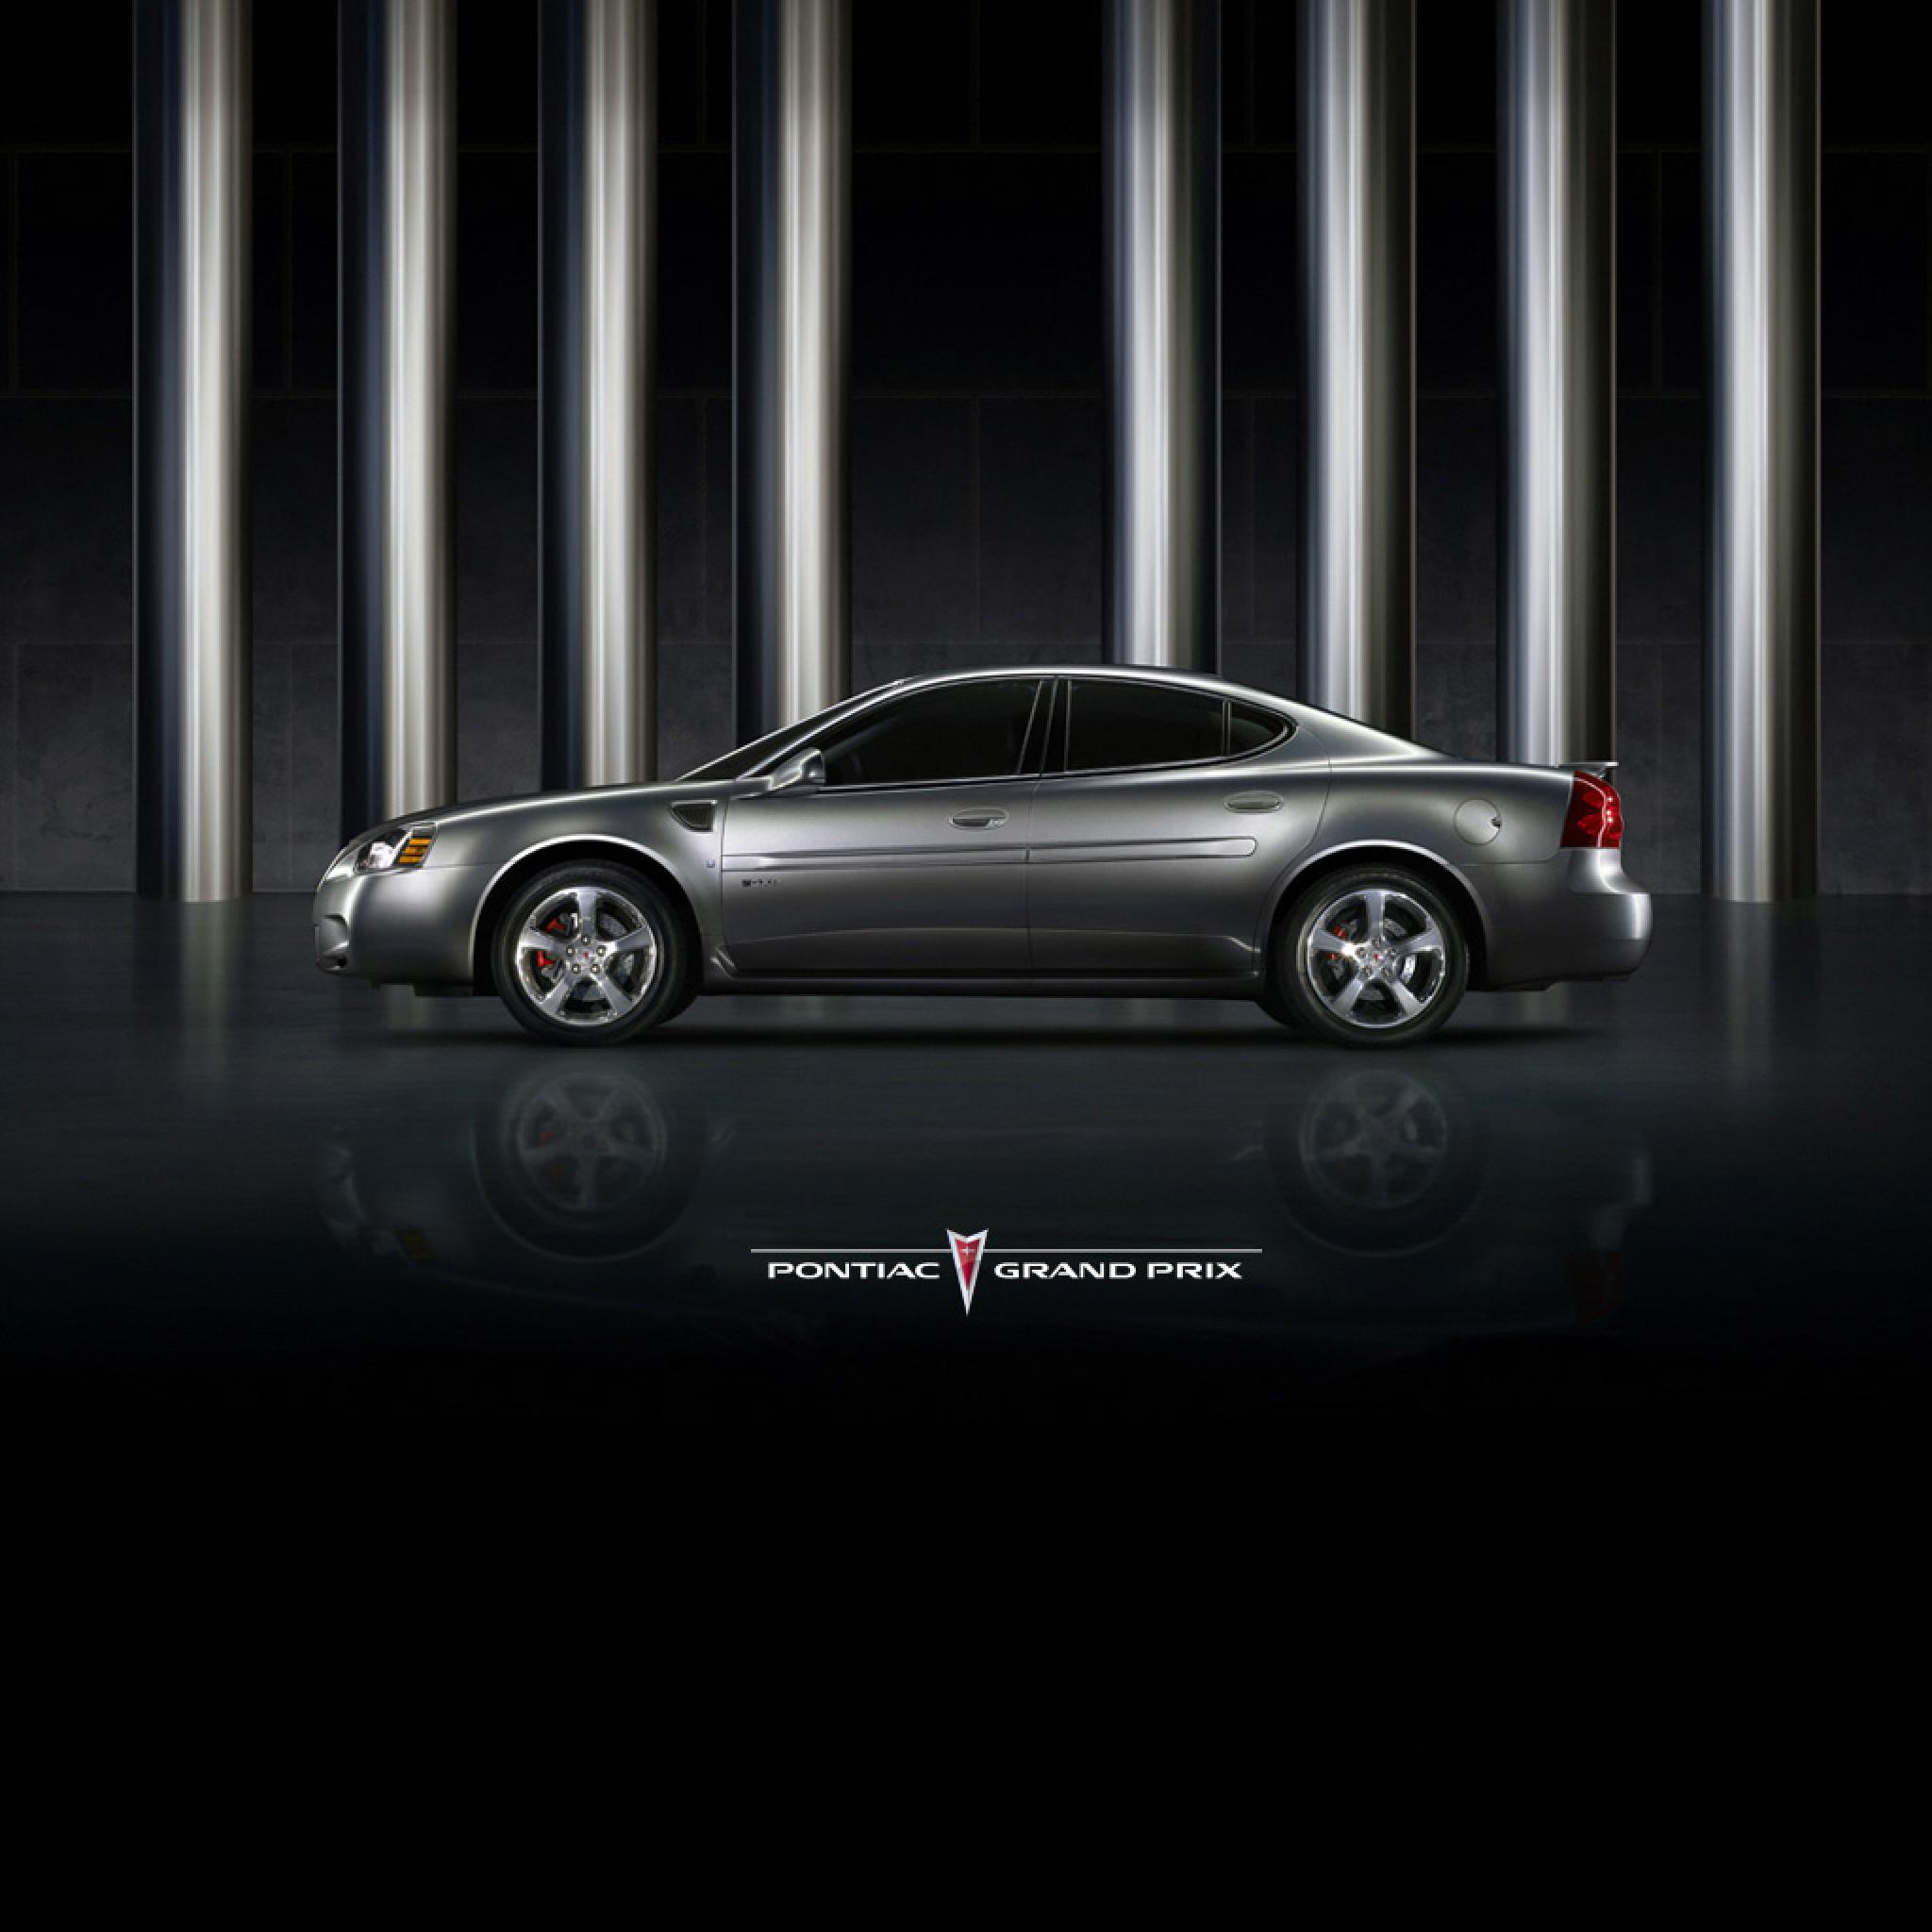 Lamborghini Cars Wallpapers In Hd Cars Pontiac Grand Prix Gxp Ipad Iphone Hd Wallpaper Free